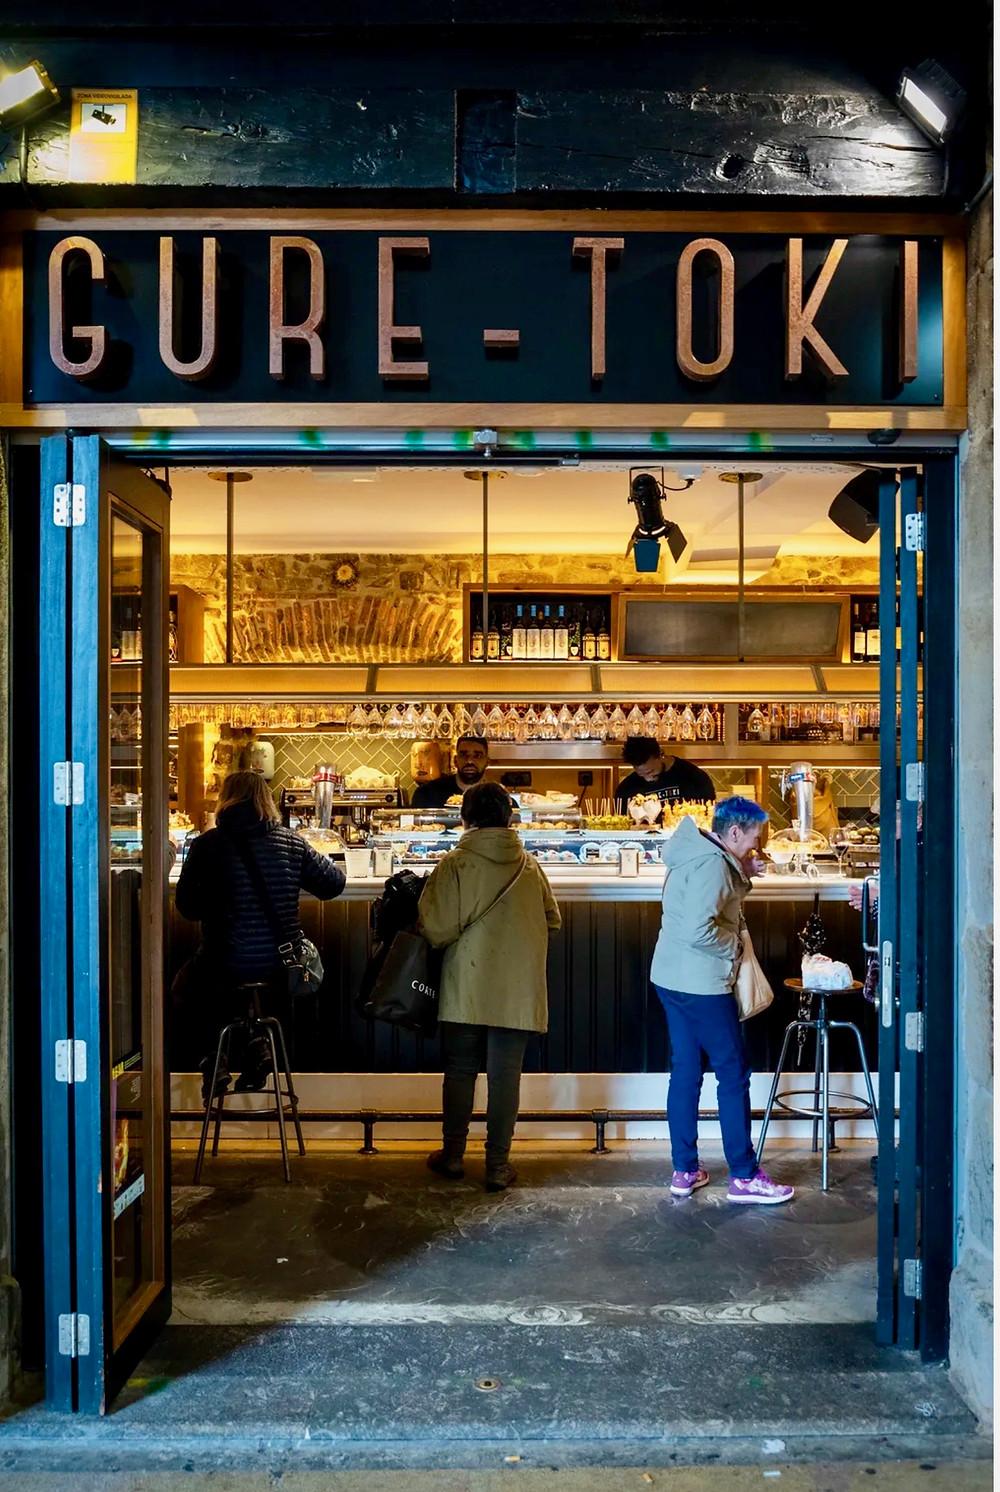 Gure-Tok, a fantastic pintxos bar in Plaza Nuevo